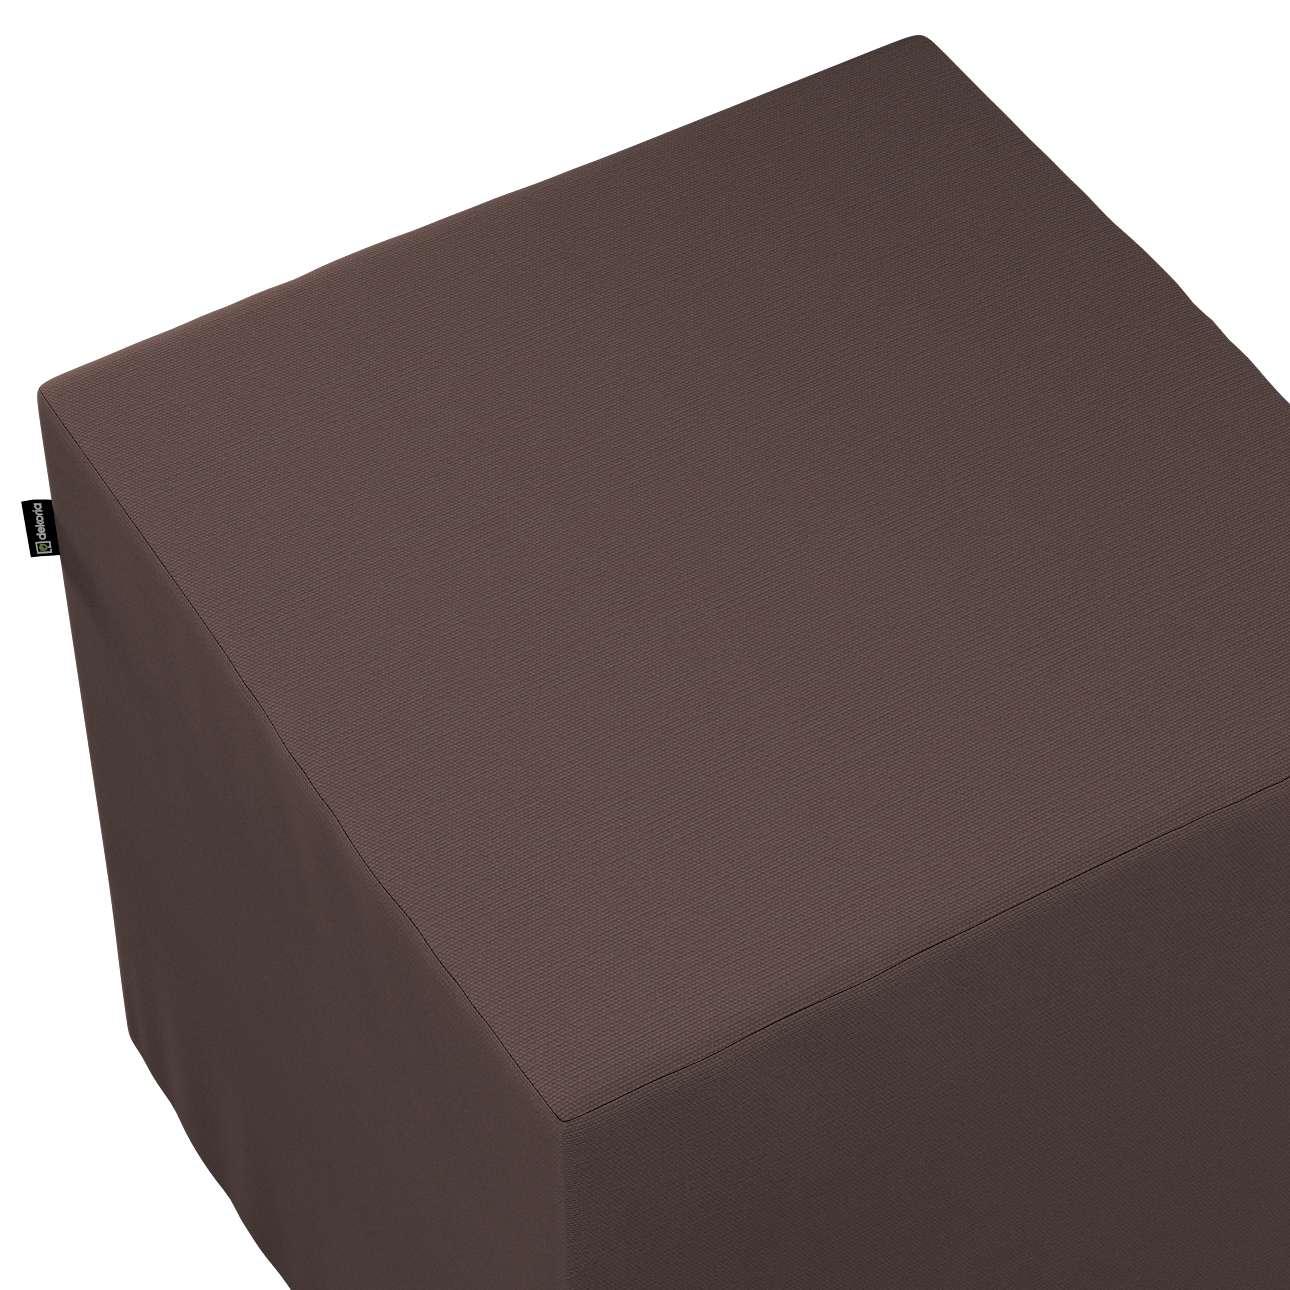 Taburetka tvrdá, kocka V kolekcii Cotton Panama, tkanina: 702-03